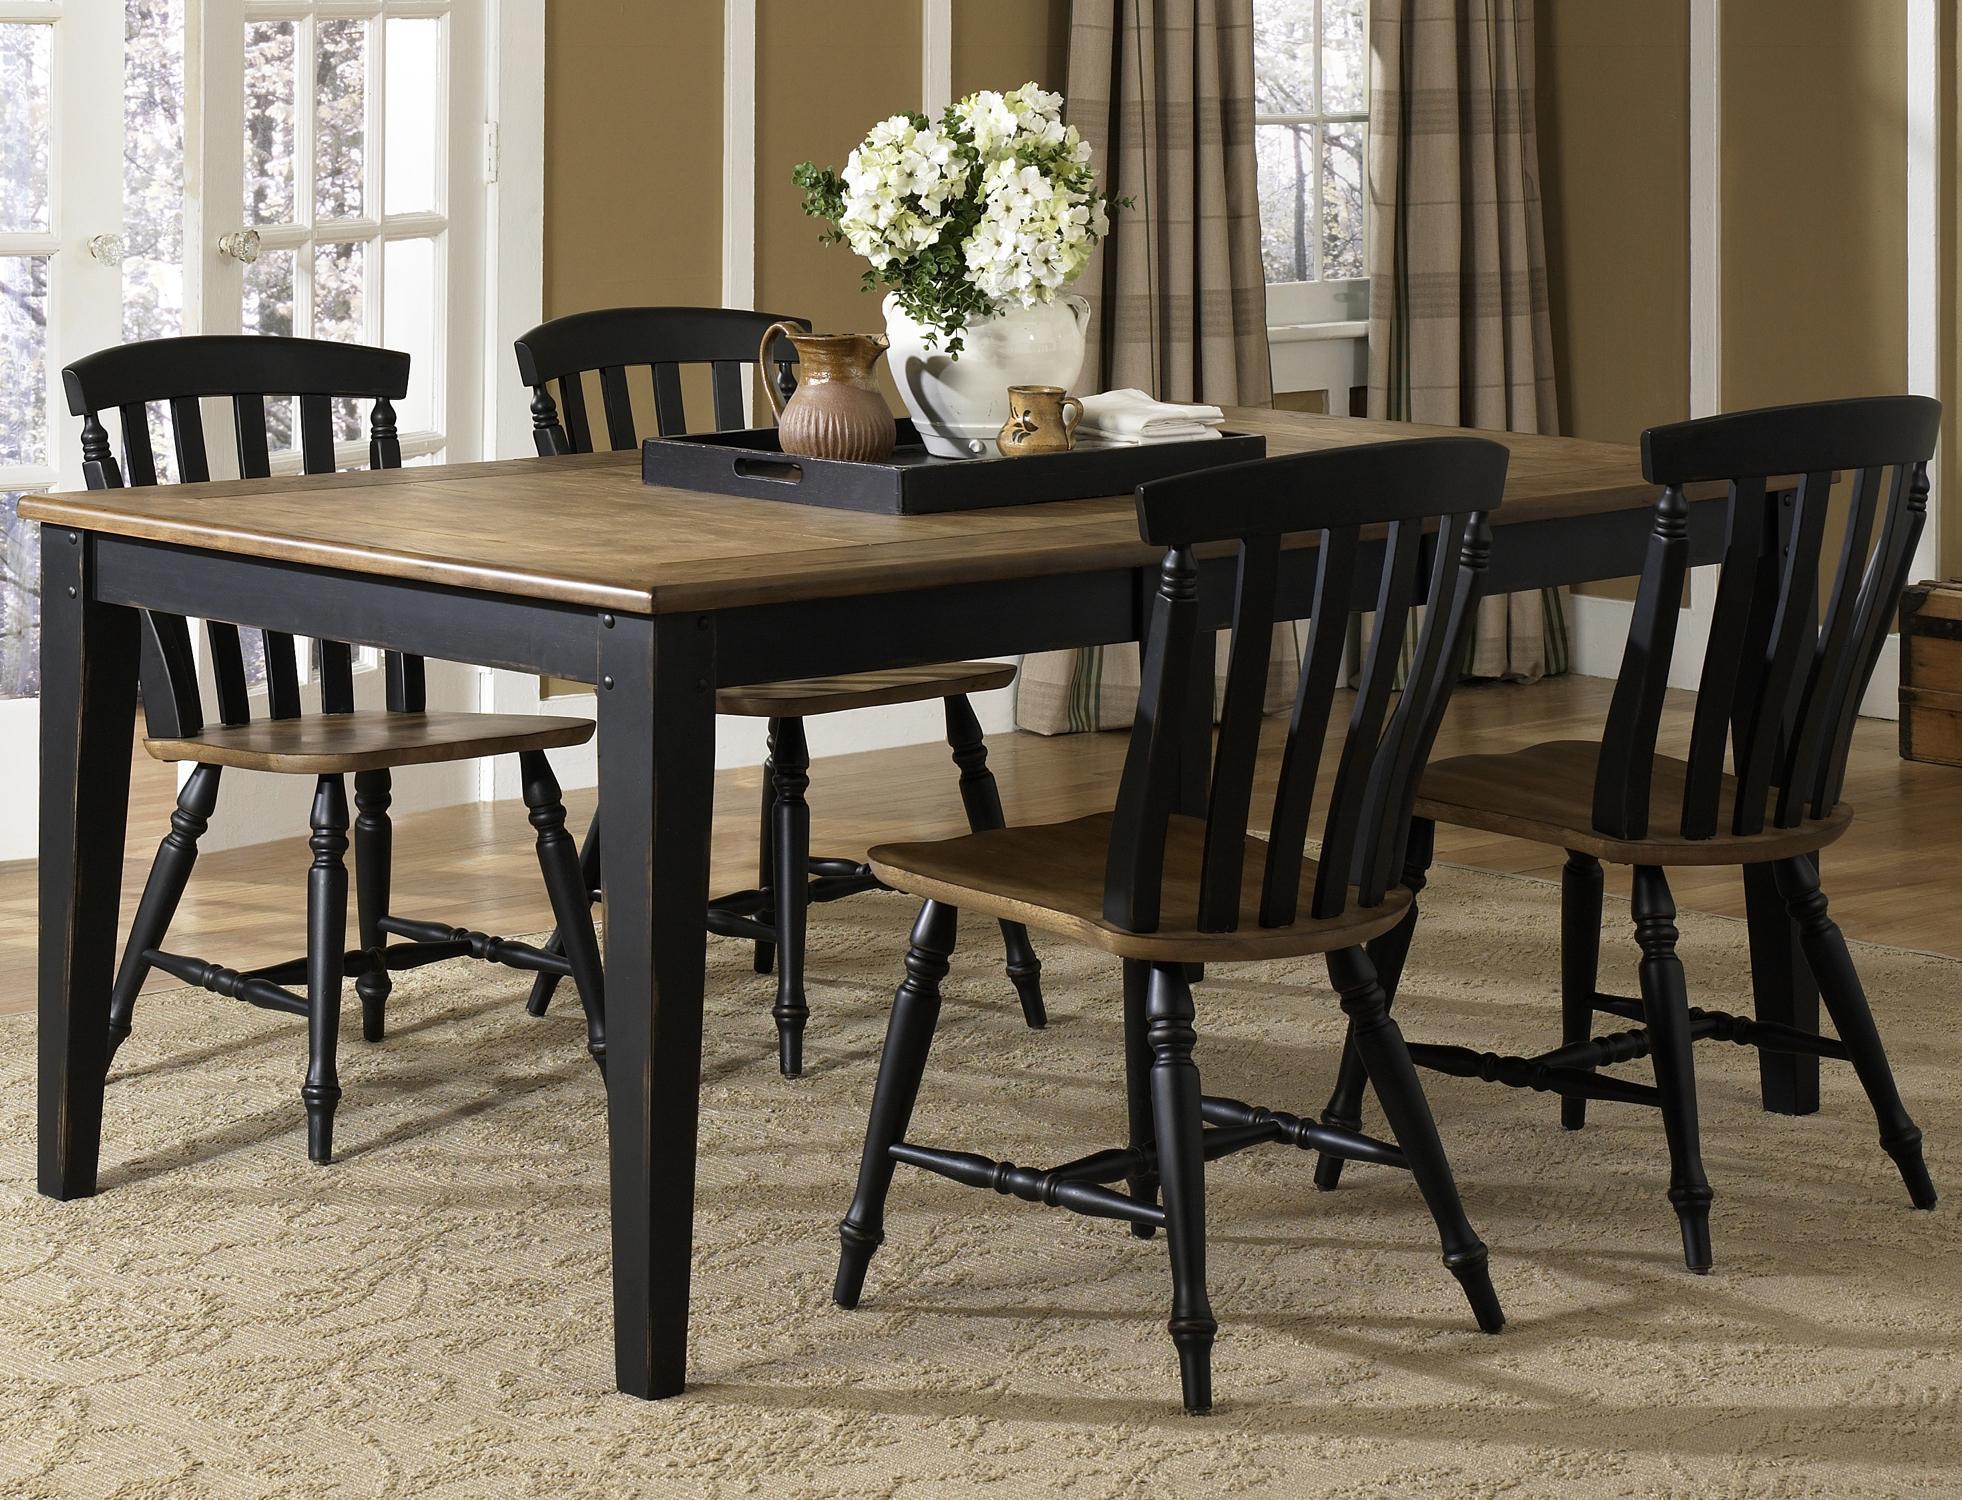 Liberty Furniture Al Fresco II 5 Piece Rectangular Table and Chairs Set - Item Number: 641-CD-SET19